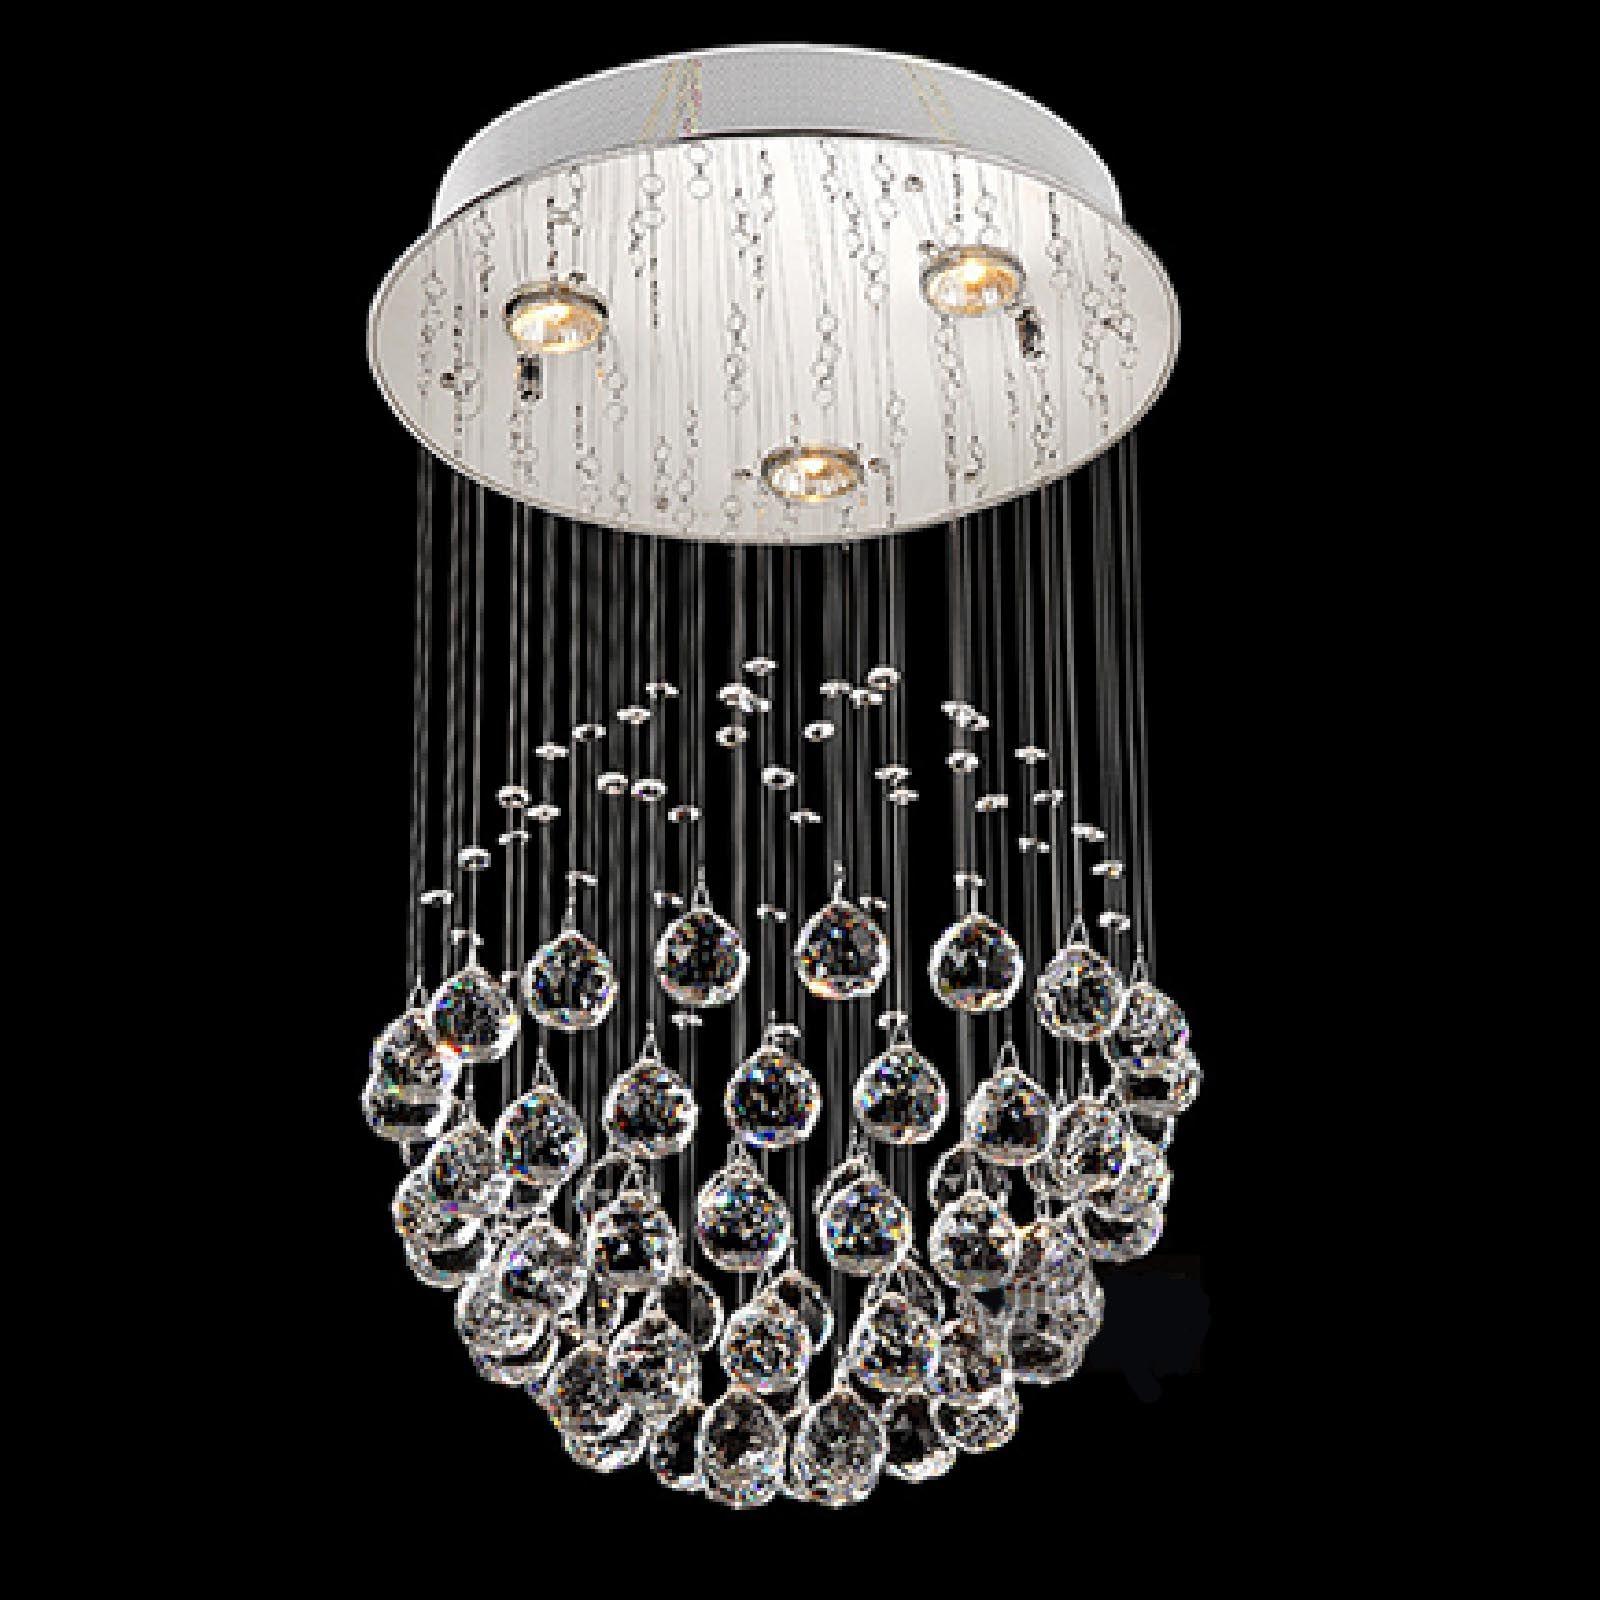 BYB Spherical Rain Drop Design Lighting Crystal Chandelier with